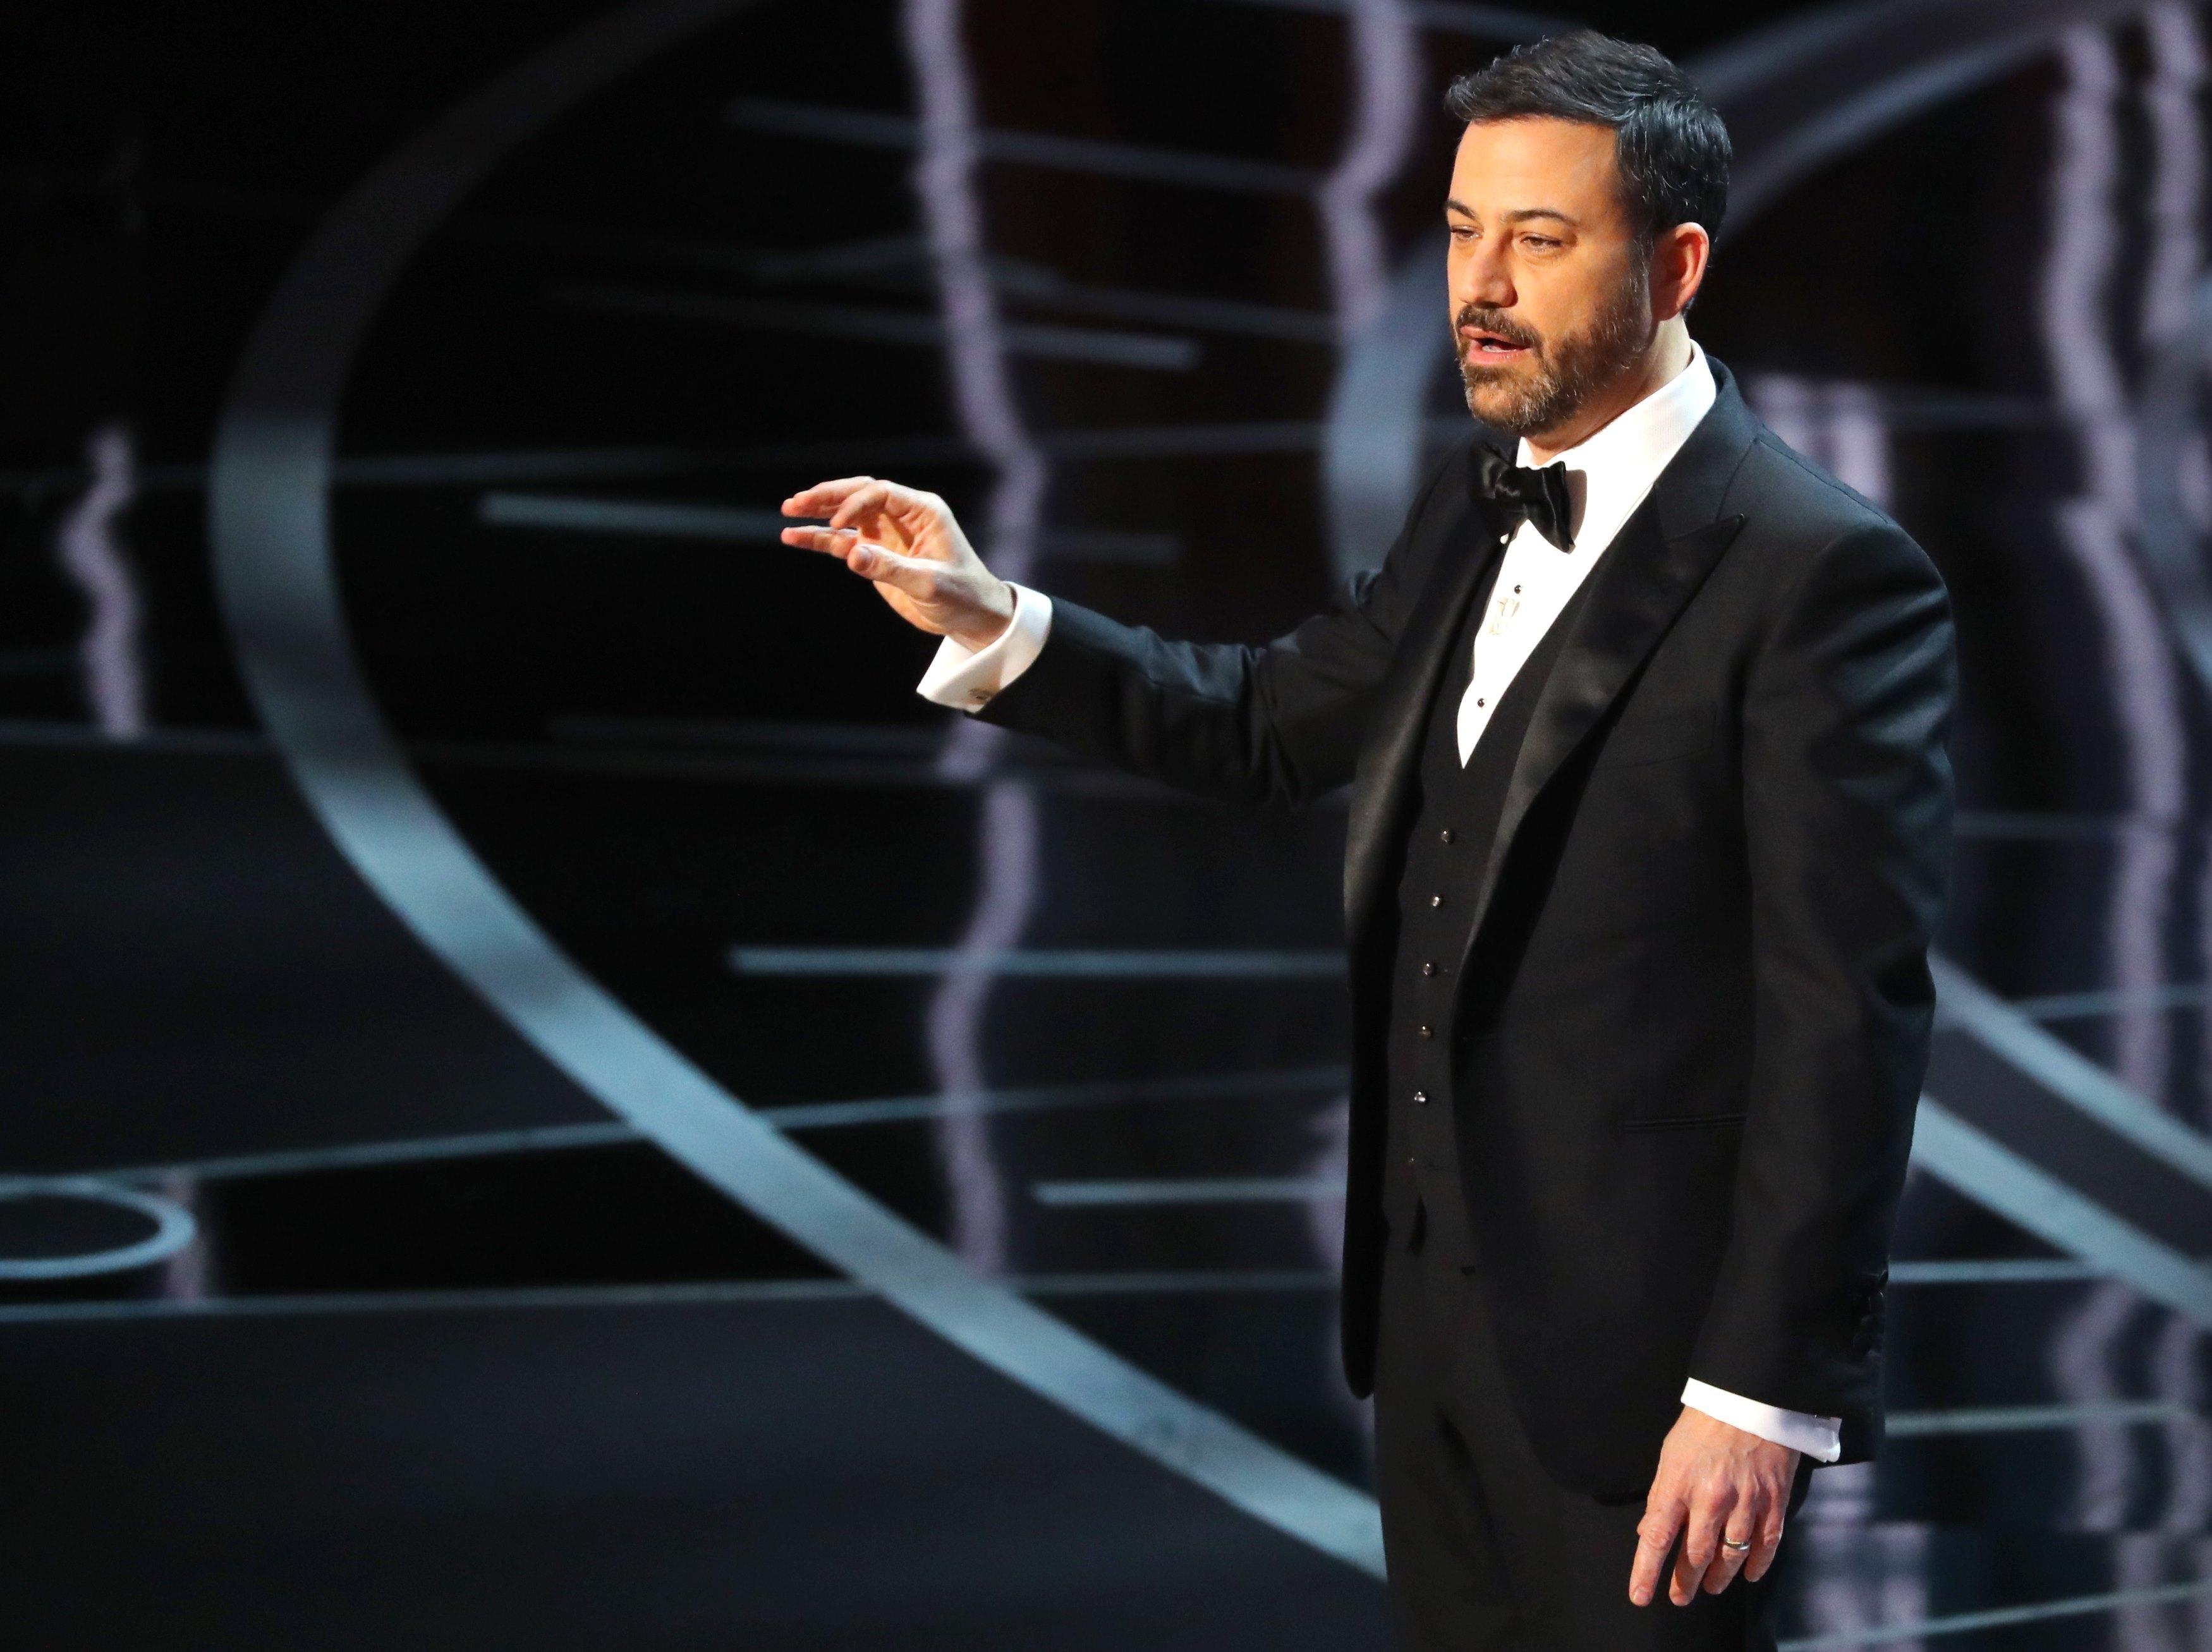 Jimmy Kimmel to return as Oscars host for 2018 (15.99 16) 17133925cab